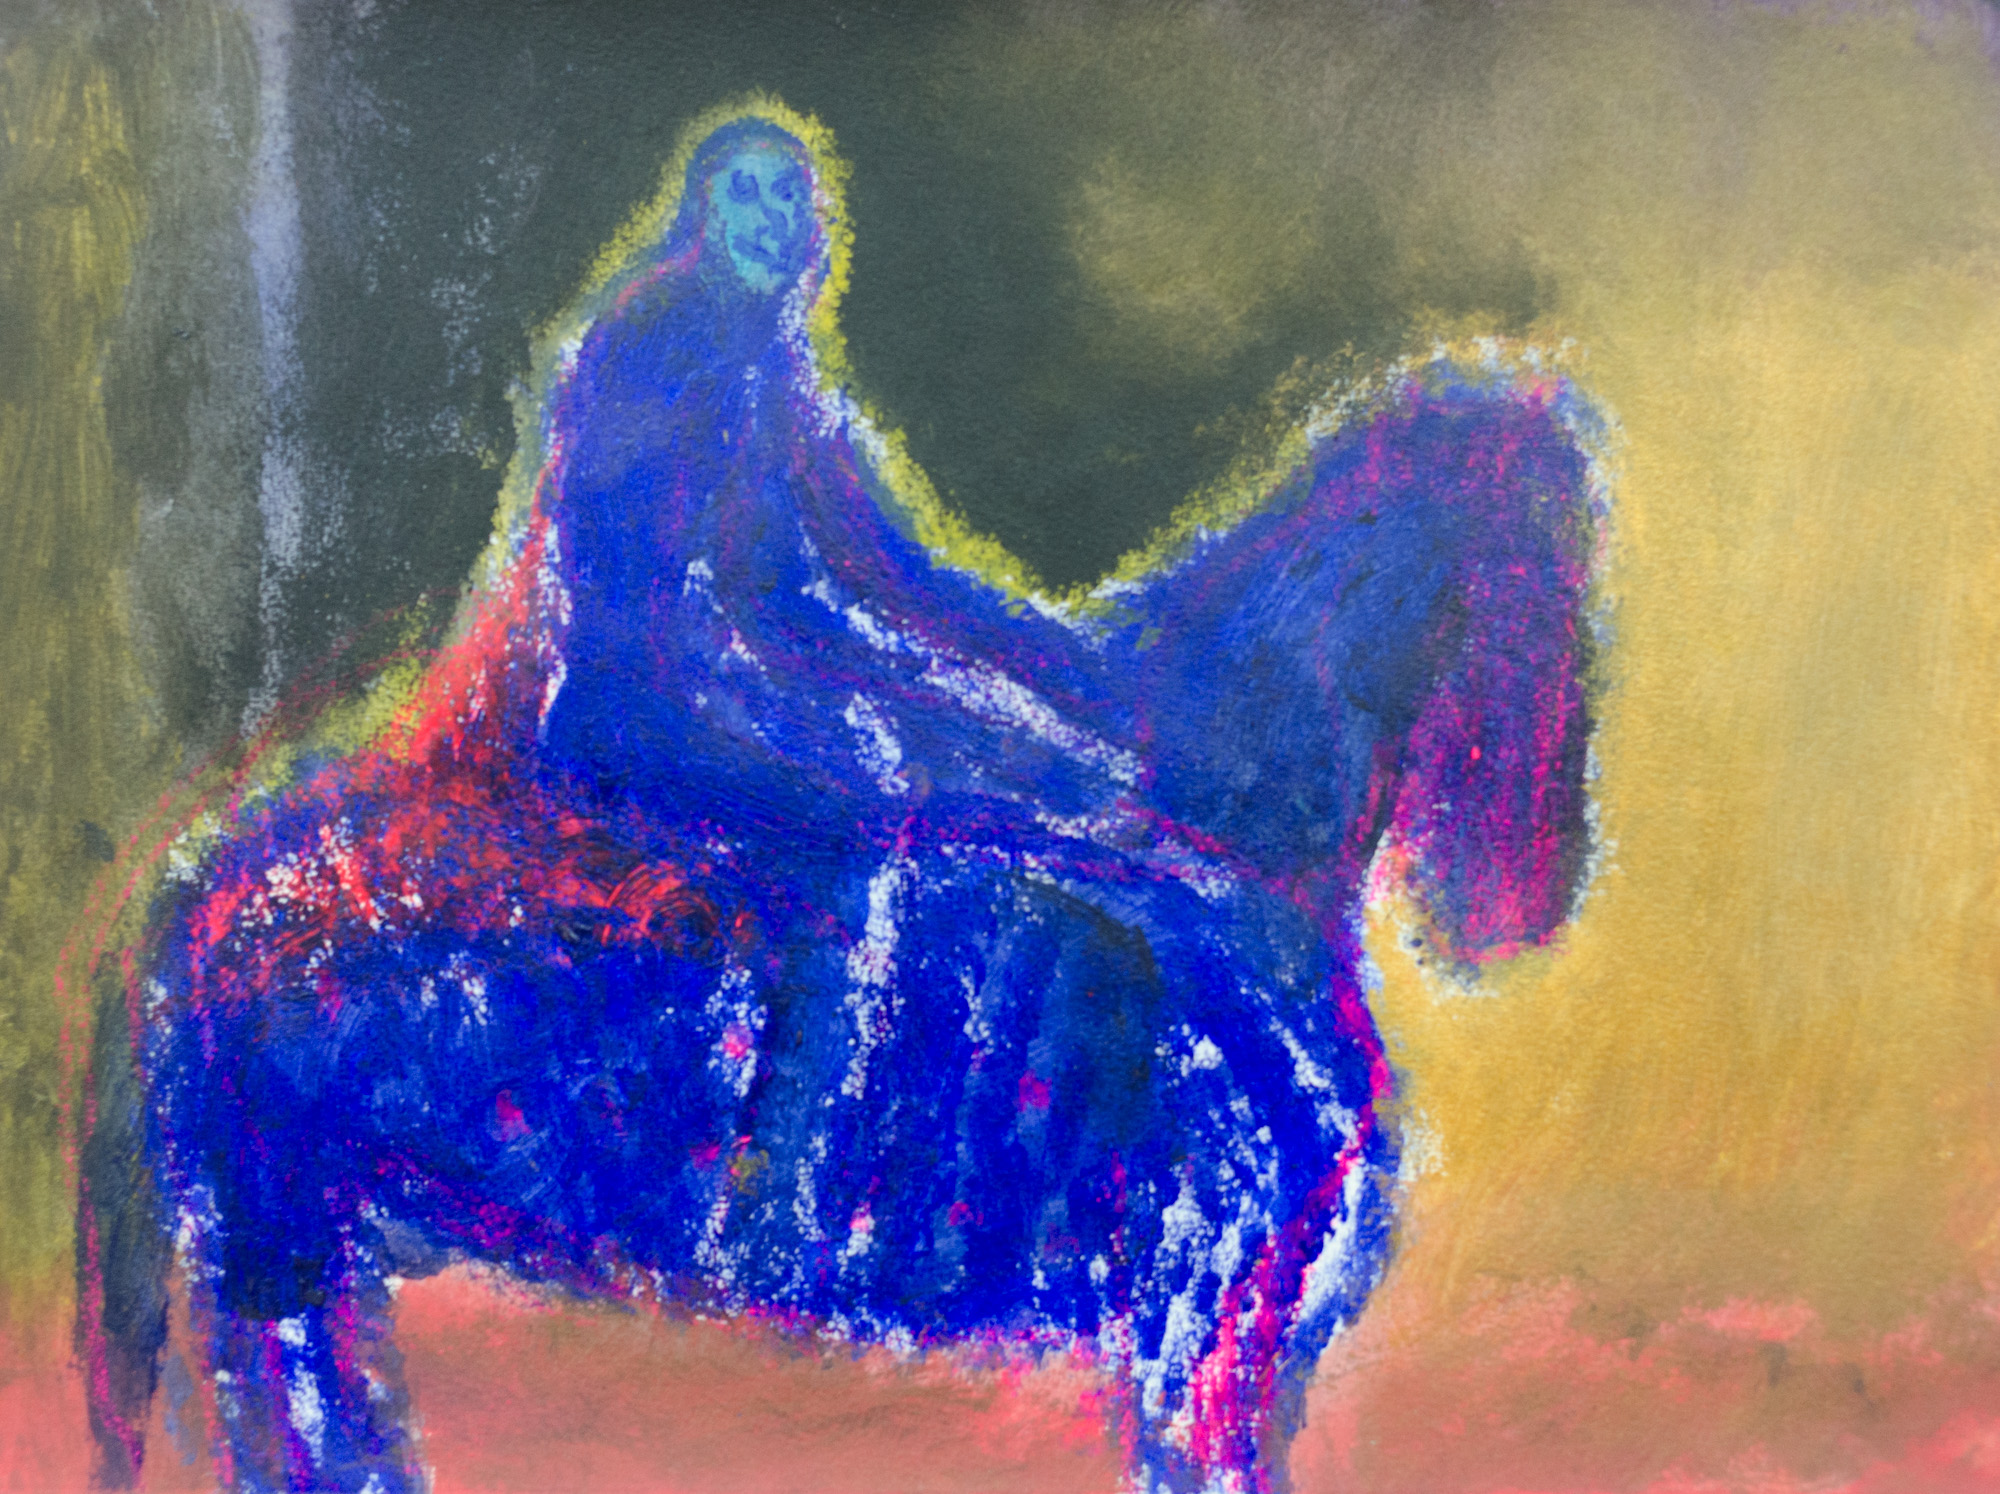 Rhys Lee, Riders, 2016, Acrylic on paper, 28 x 38cm, $700-28.jpg